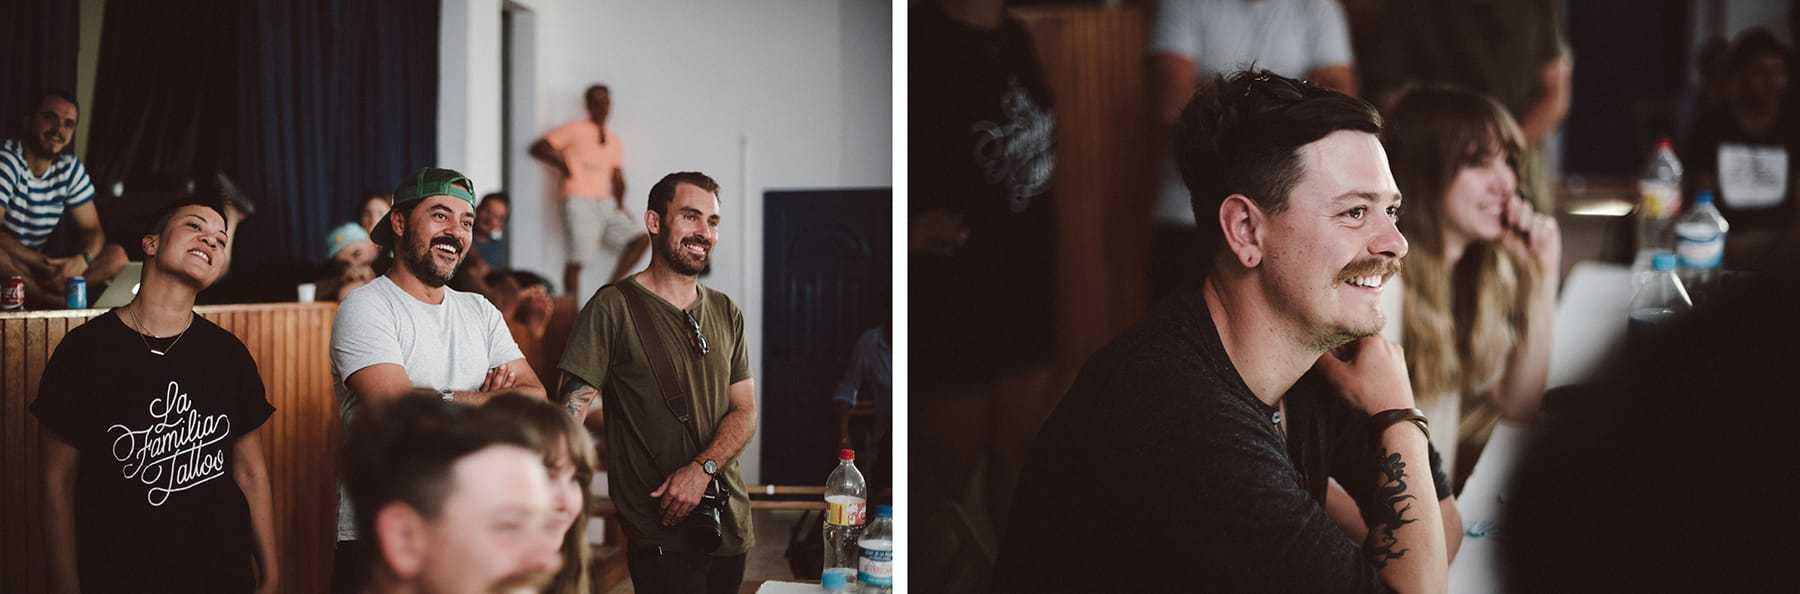 wolves_workshop_hilario_sanchez_fotografo_boda_españa_446